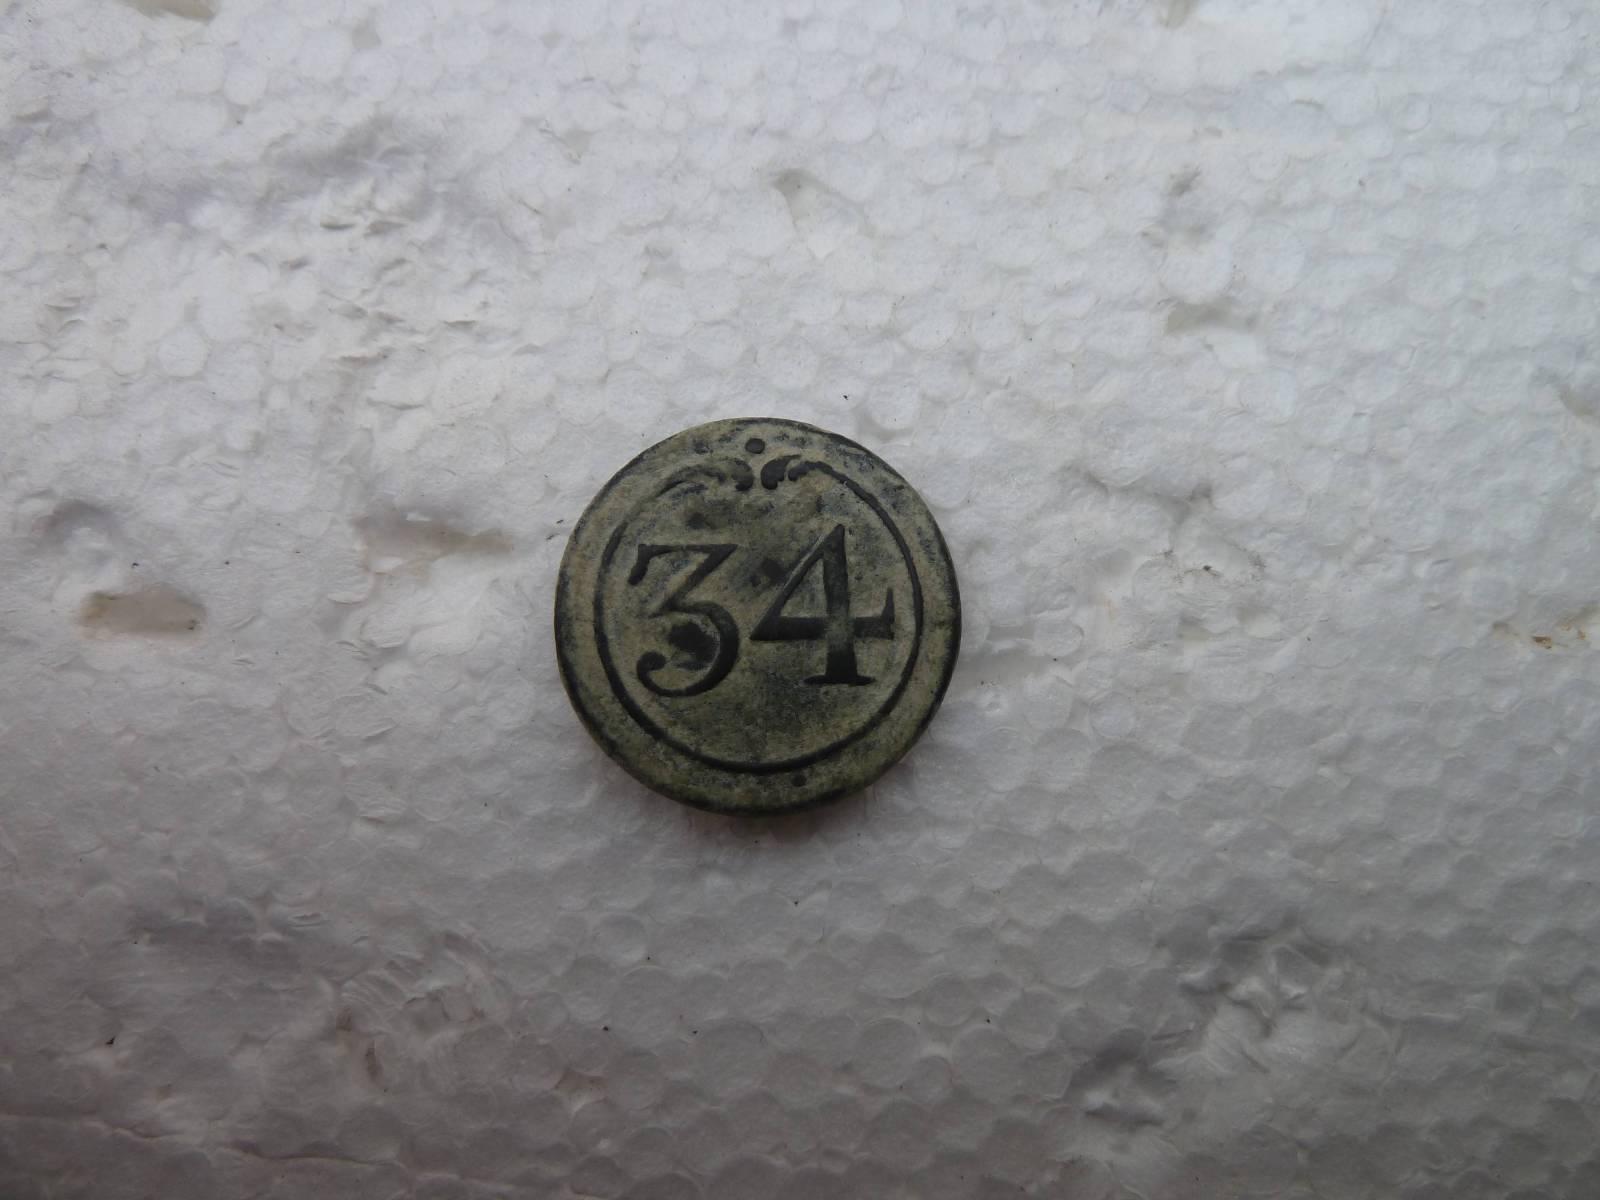 Botón del 34 Rgto. de Infantería de Línea, francés 1803-1815 2qntzt0